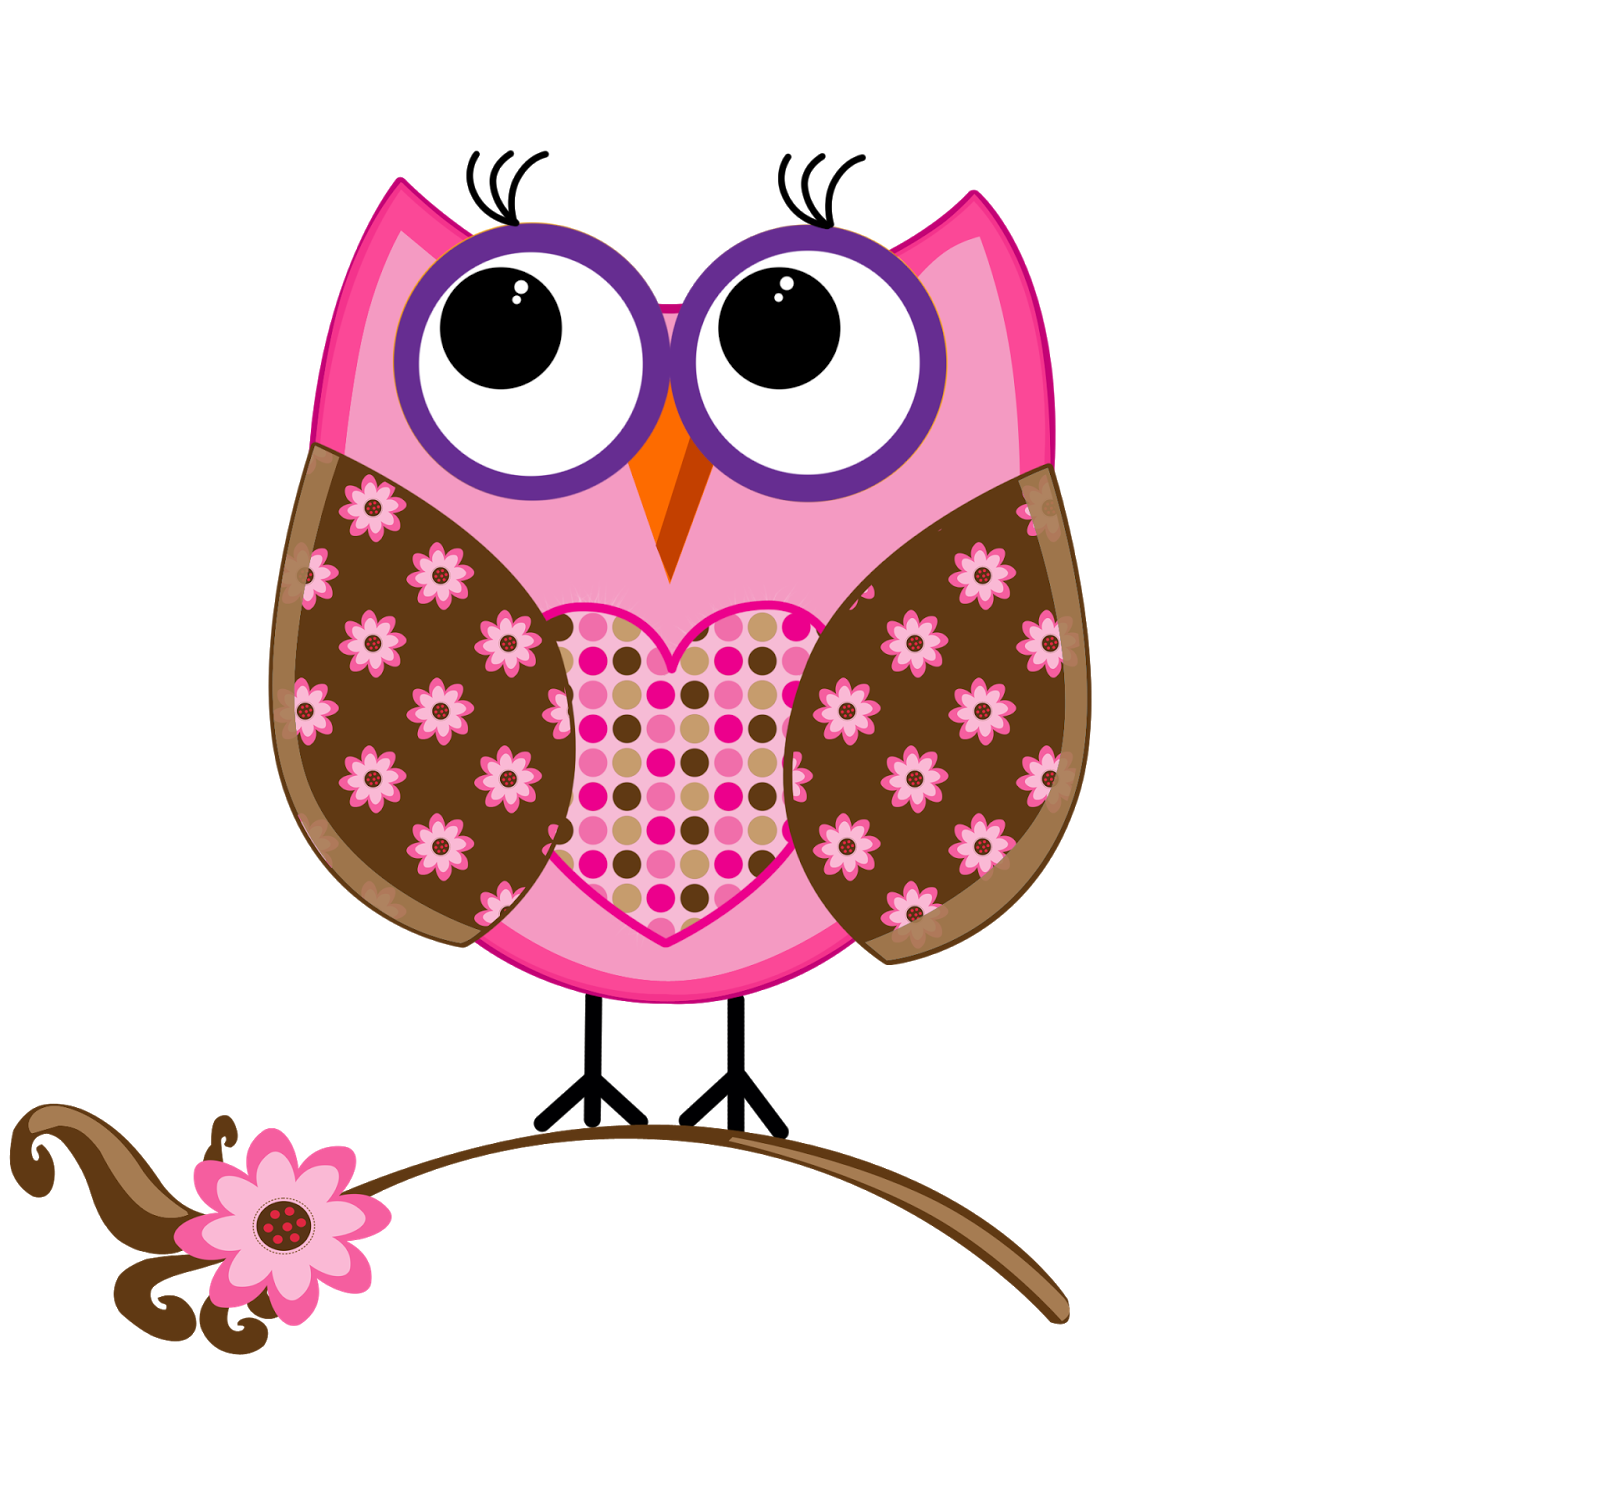 Frames clipart owl. Marcos gratis para fotos